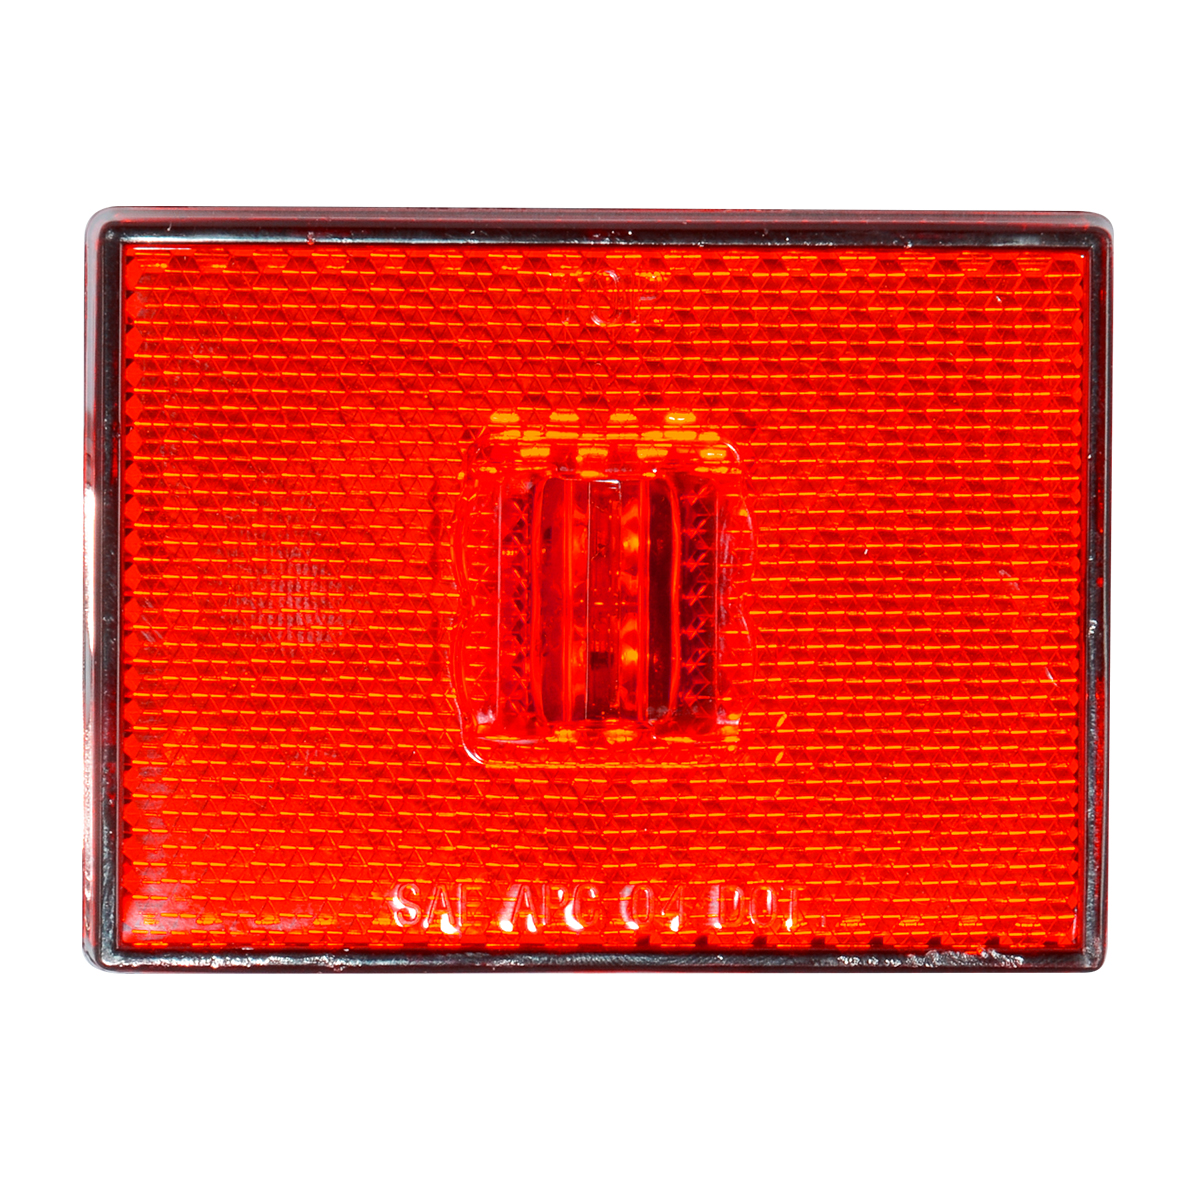 78381 Rectangular Stud Mount LED Marker Light with Reflector Lens